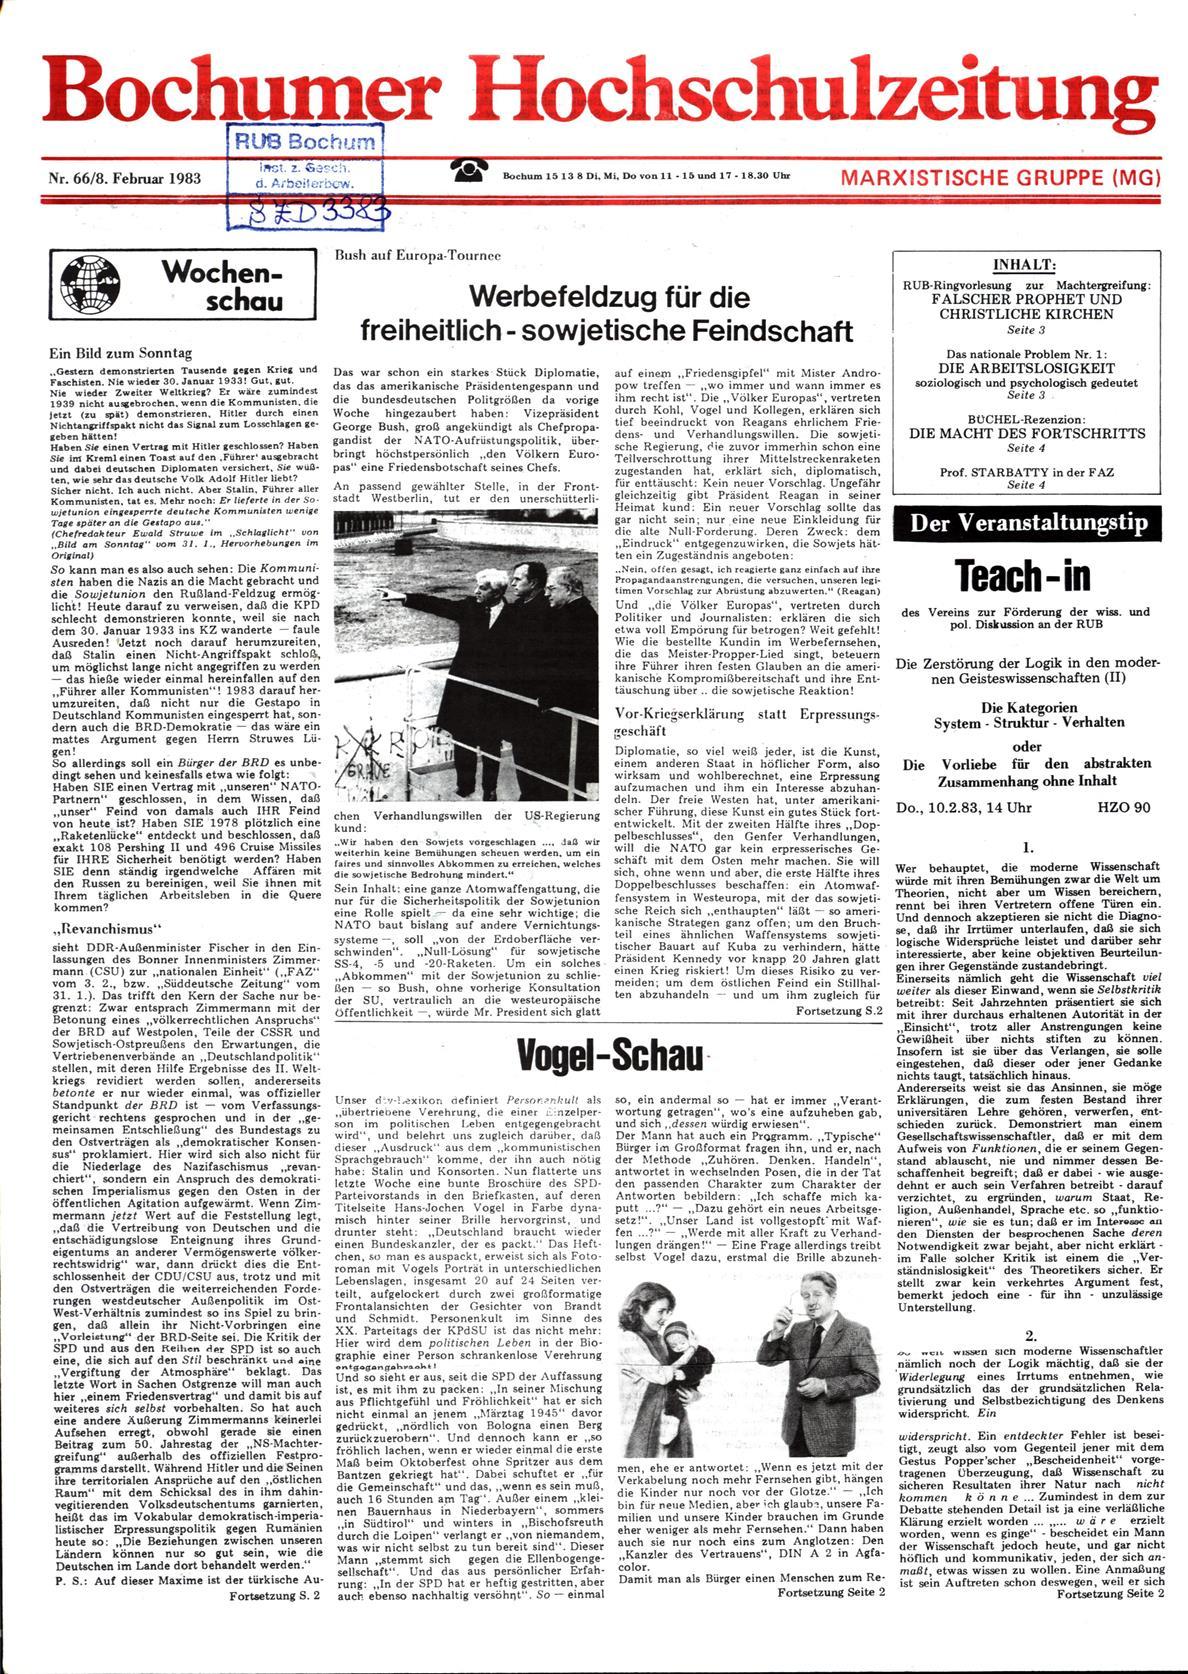 Bochum_BHZ_19830208_066_001